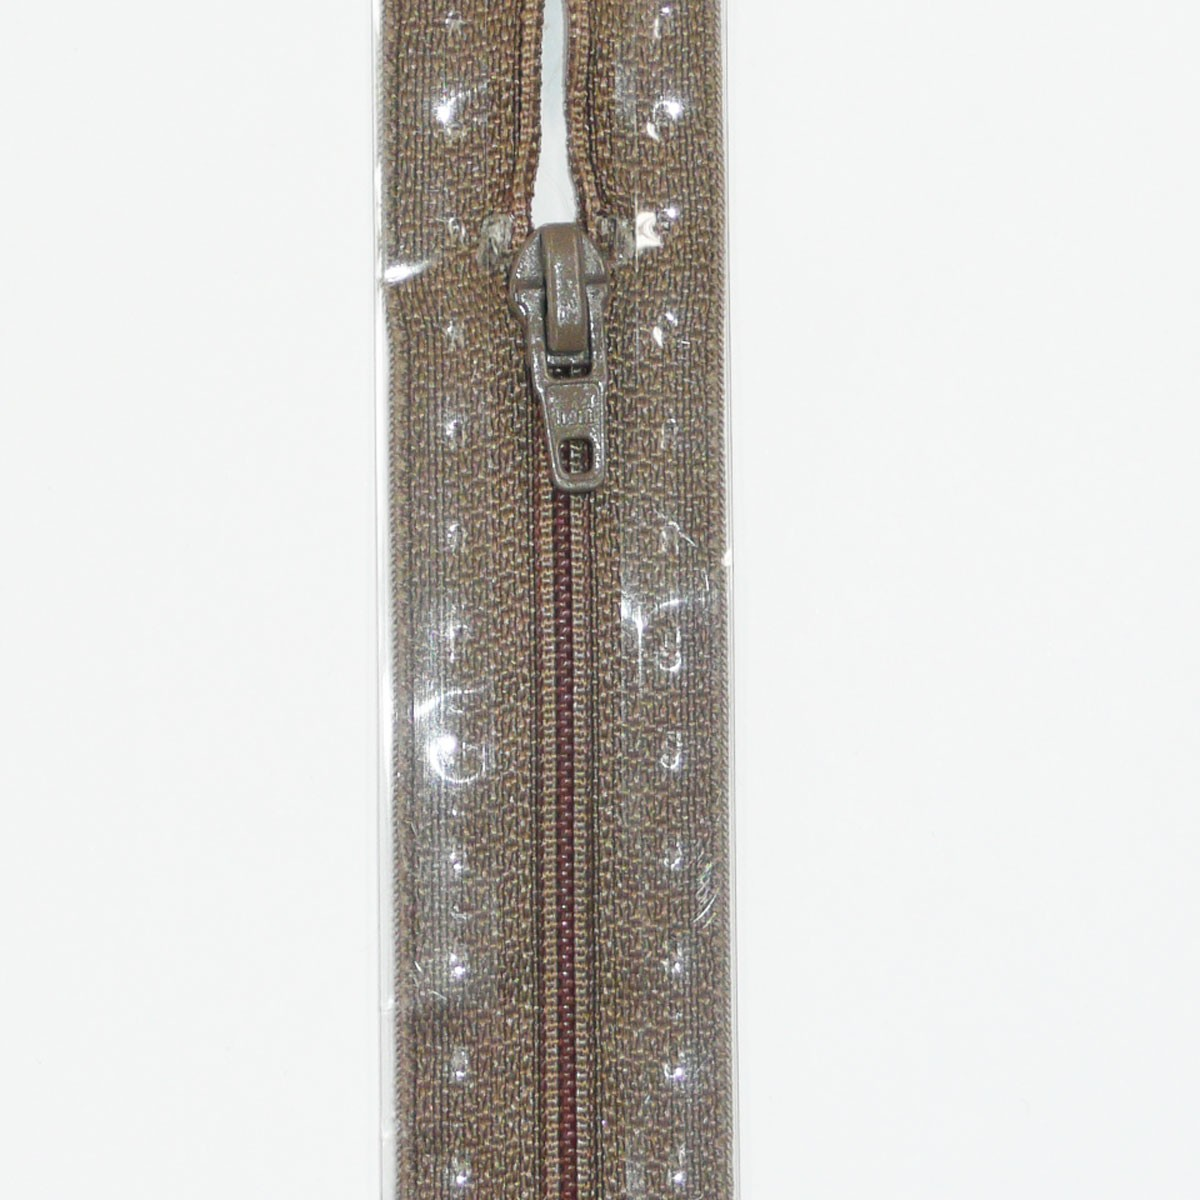 RV S1 Typ 0 ut 22 cm Fla graubraun